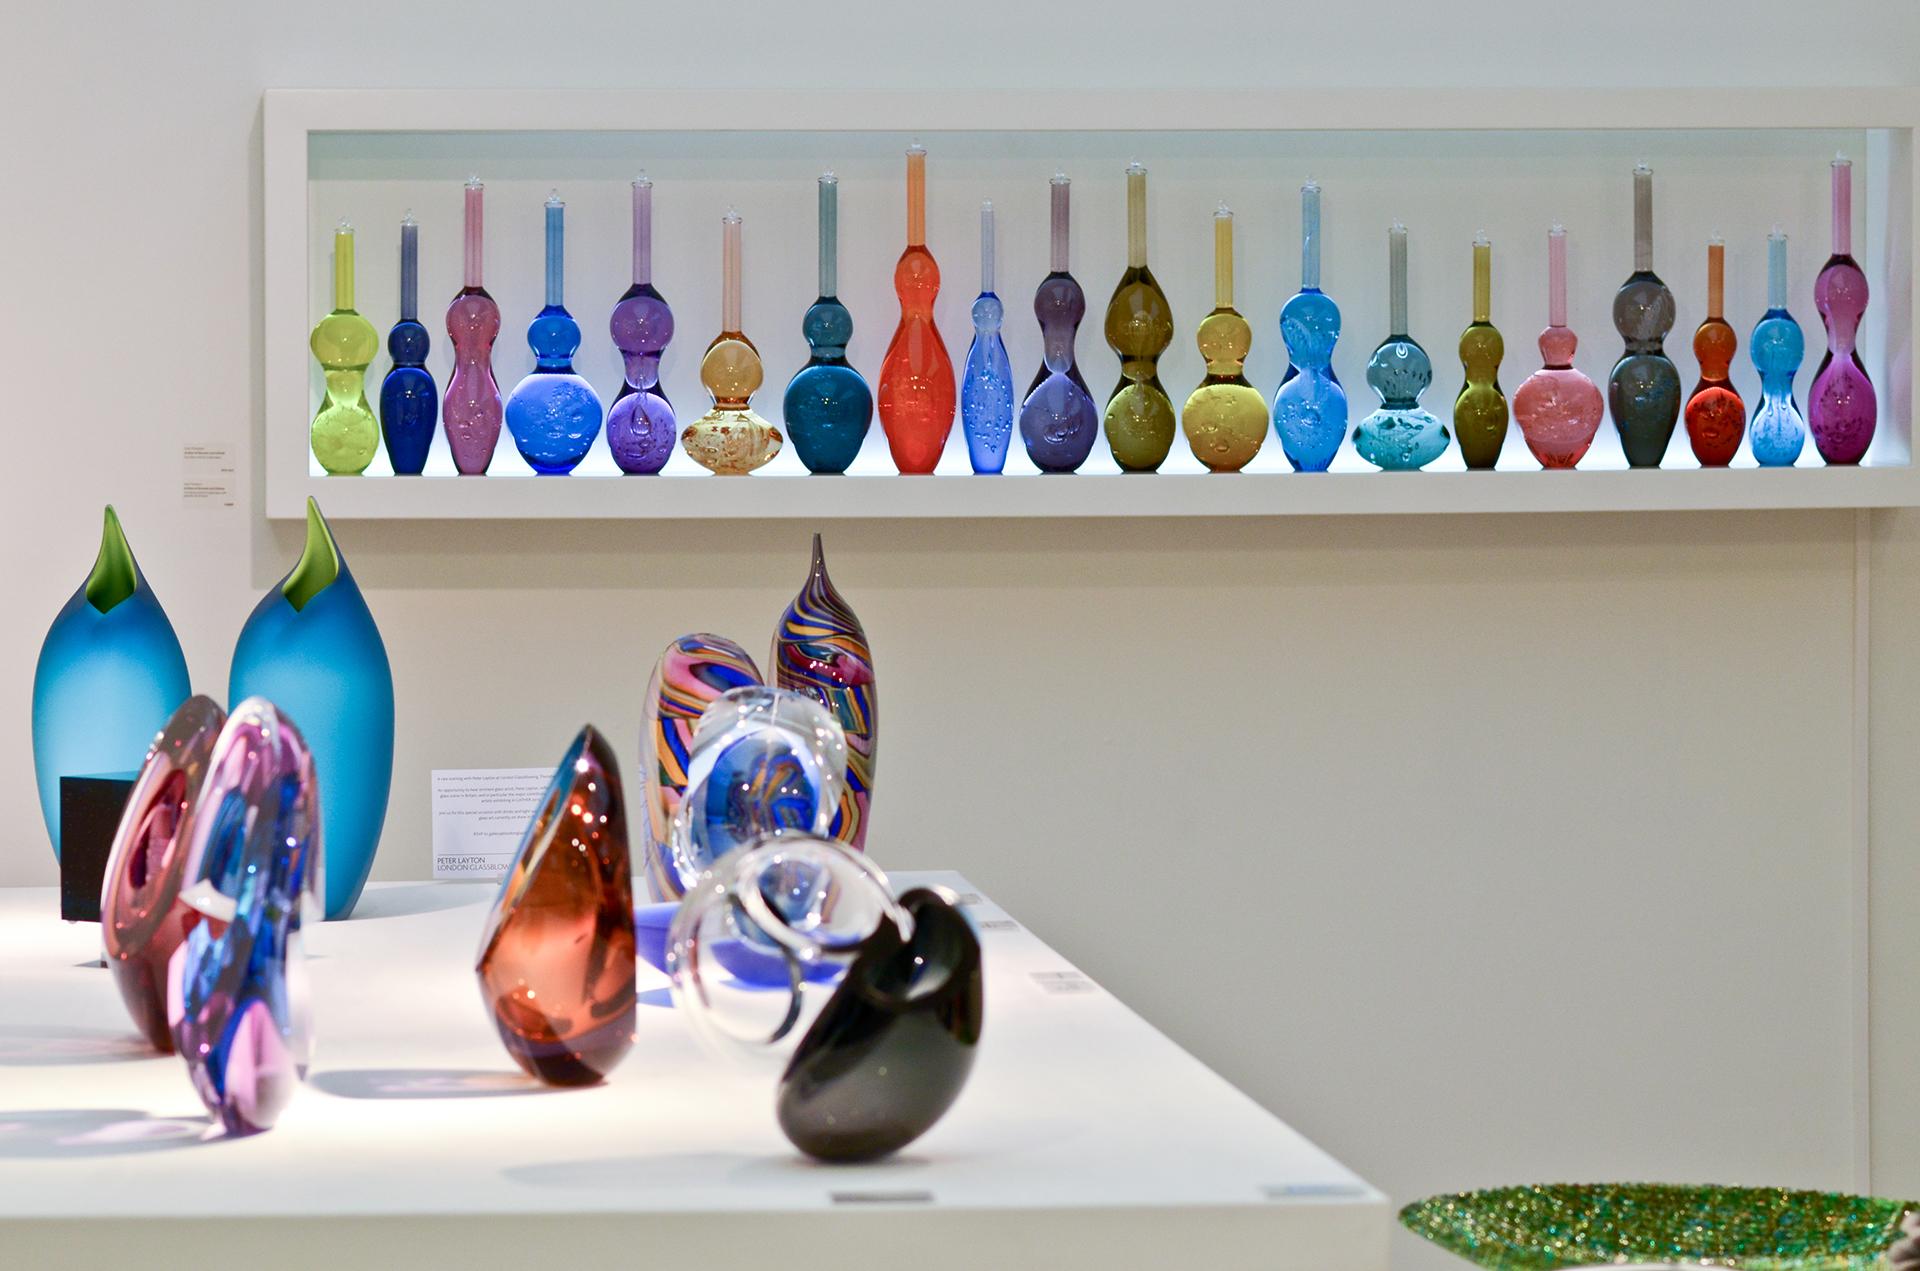 Contemporary Glassware displayed in Bespoke Vitrines